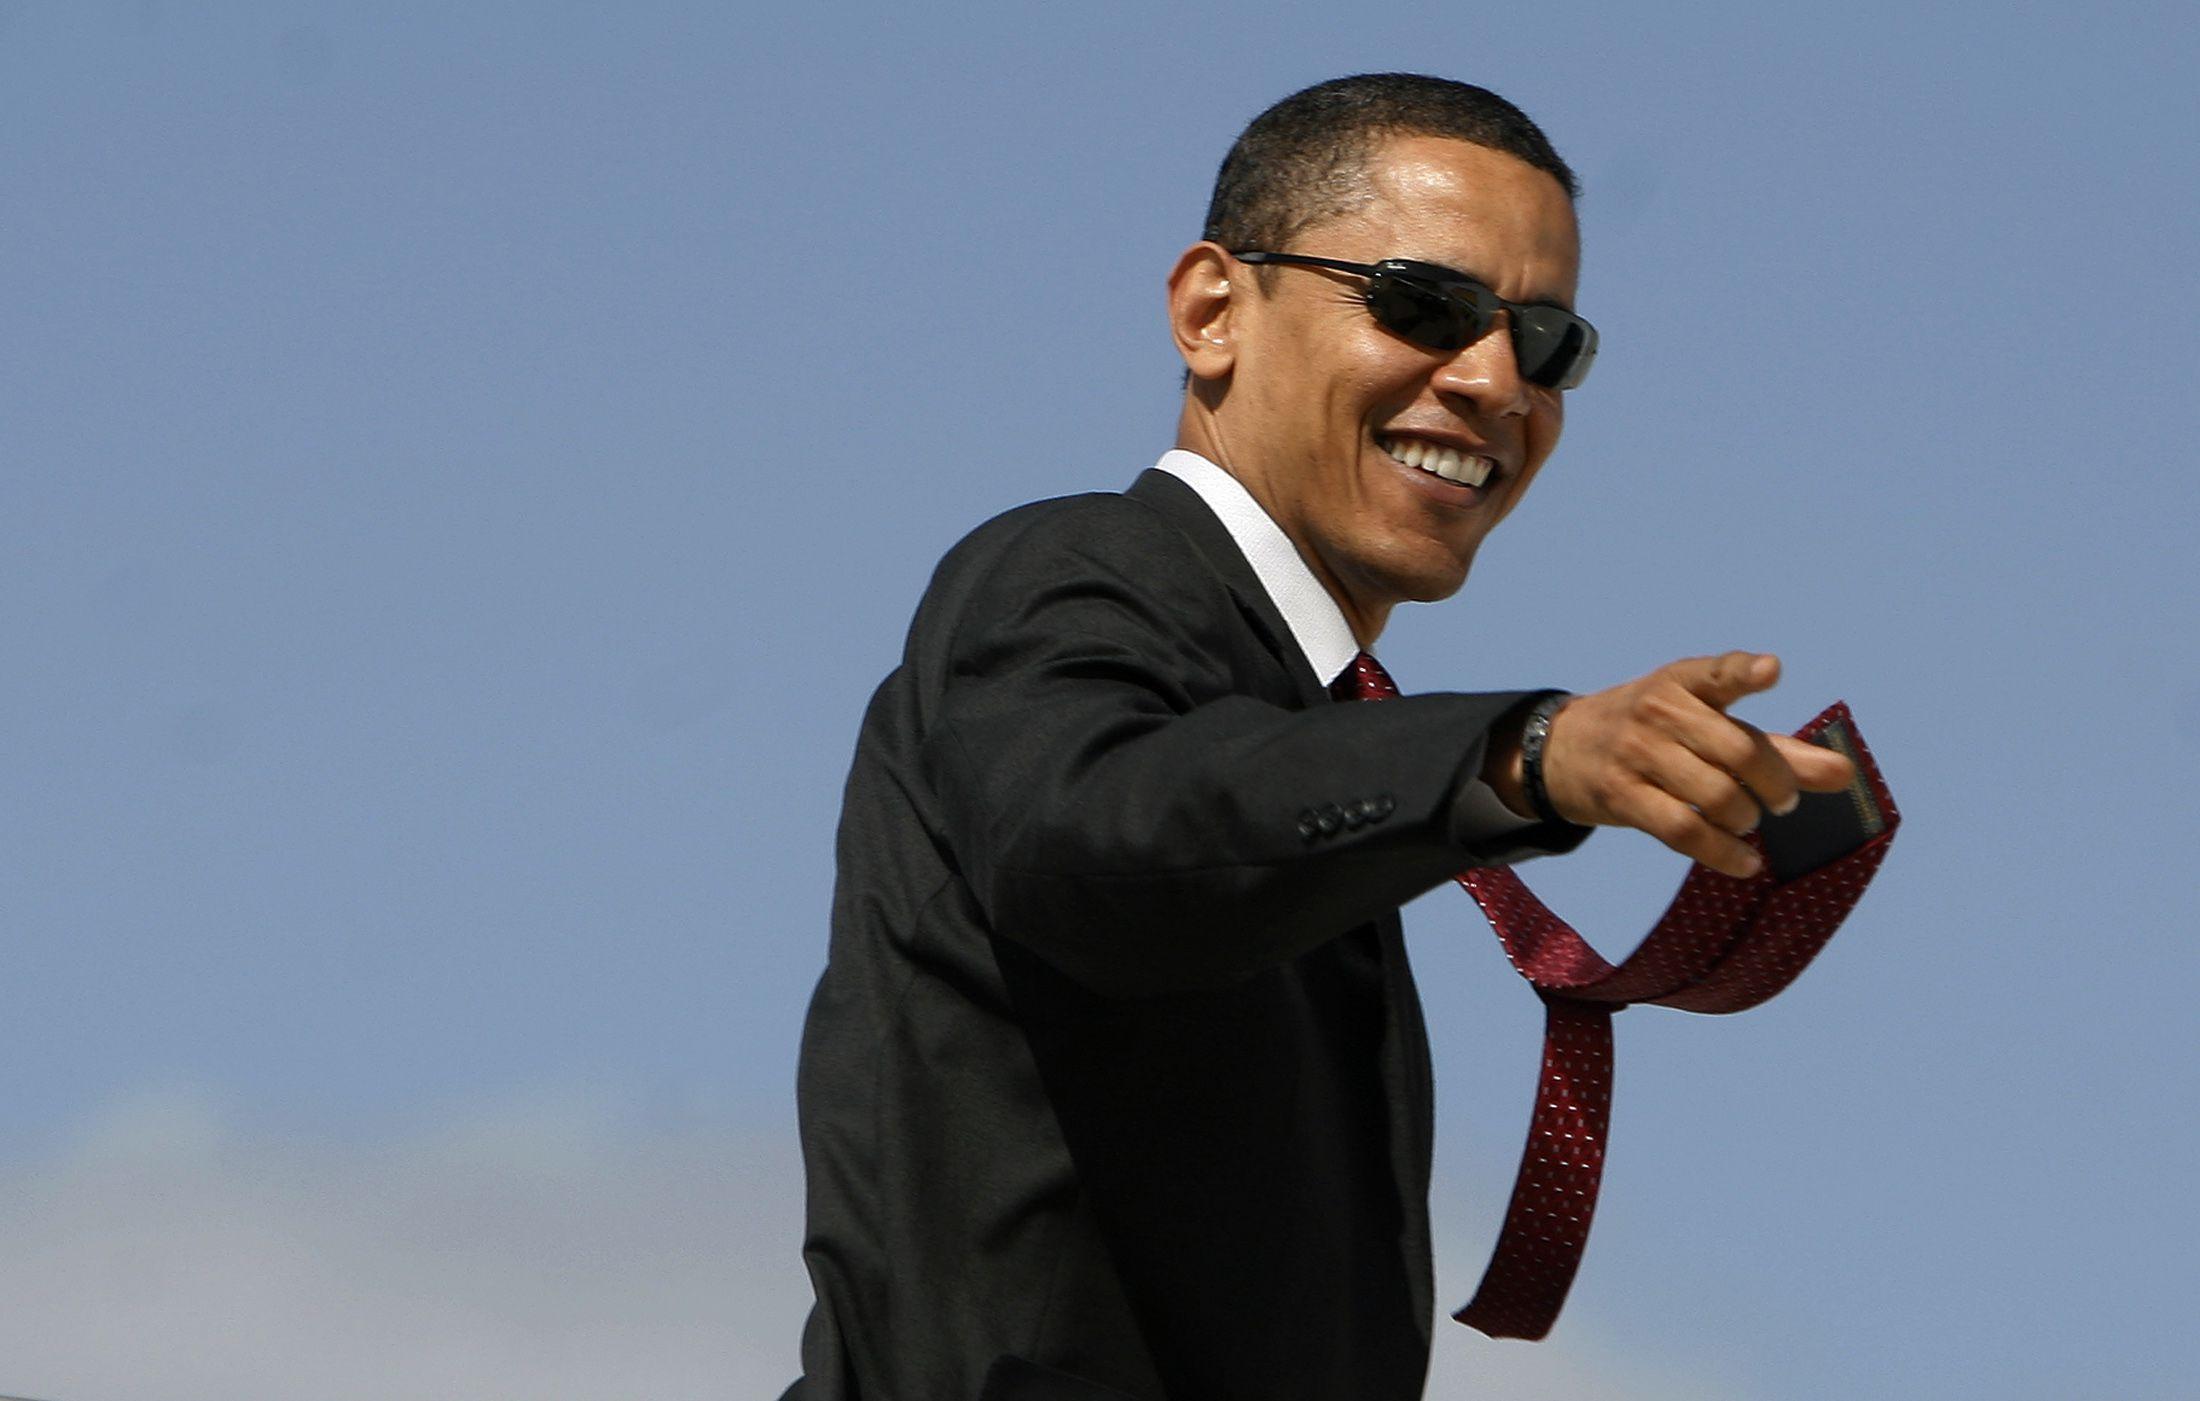 US Democratic presidential candidate Senator Barack Obama (D-IL) boards his campaign plane in San Antonio, Texas, March 3, 2008. REUTERS/Jim Young   (UNITED STATES) US PRESIDENTIAL ELECTION CAMPAIGN 2008 (USA) Also see: GF2E45R06AS01 - RTR1XUHX